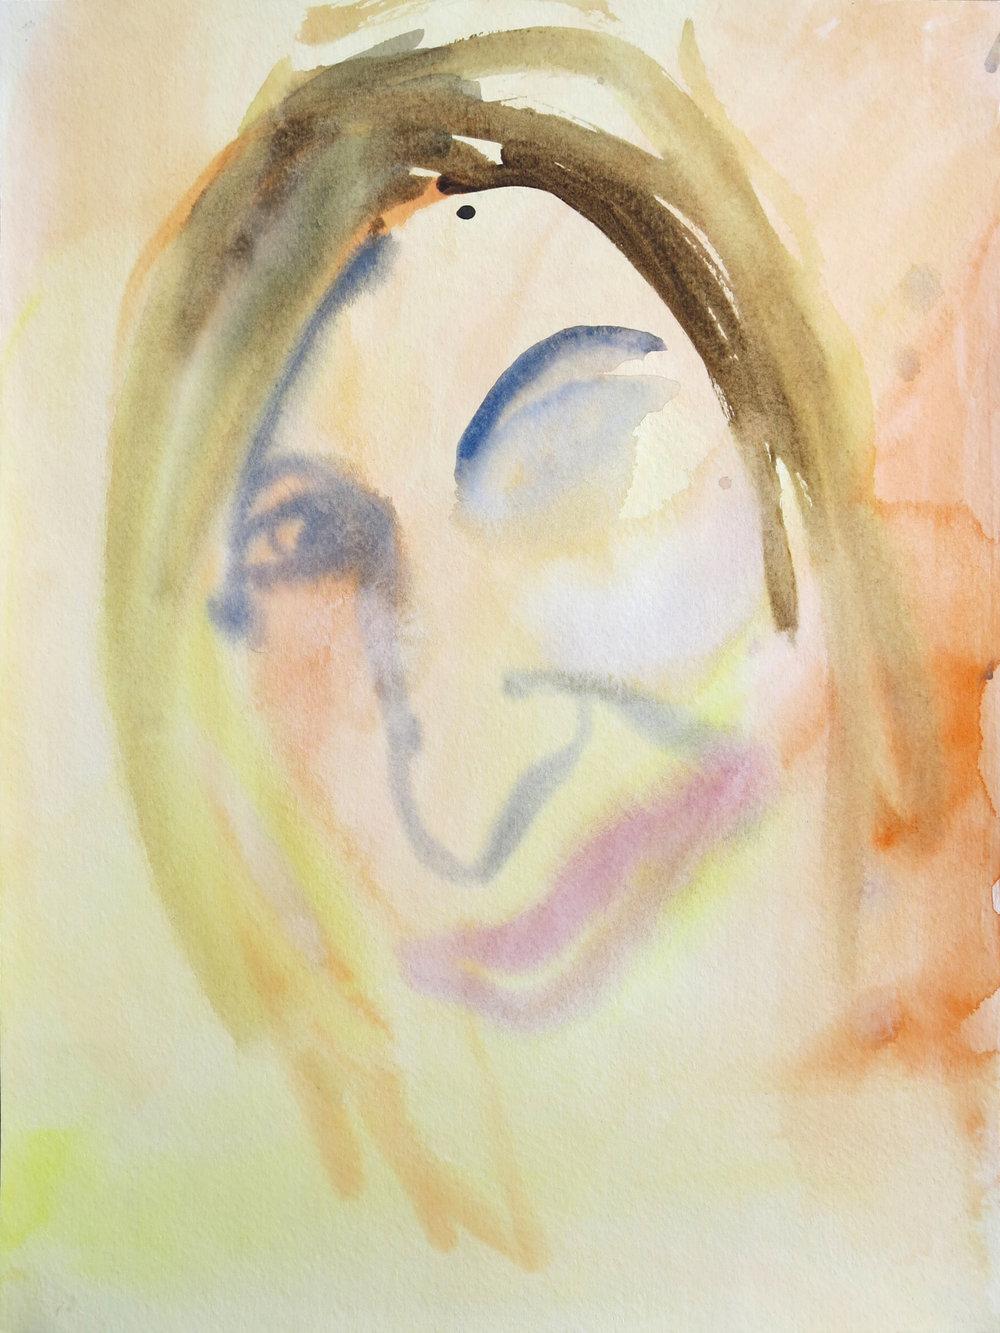 Barbra Streisand Portrait #136